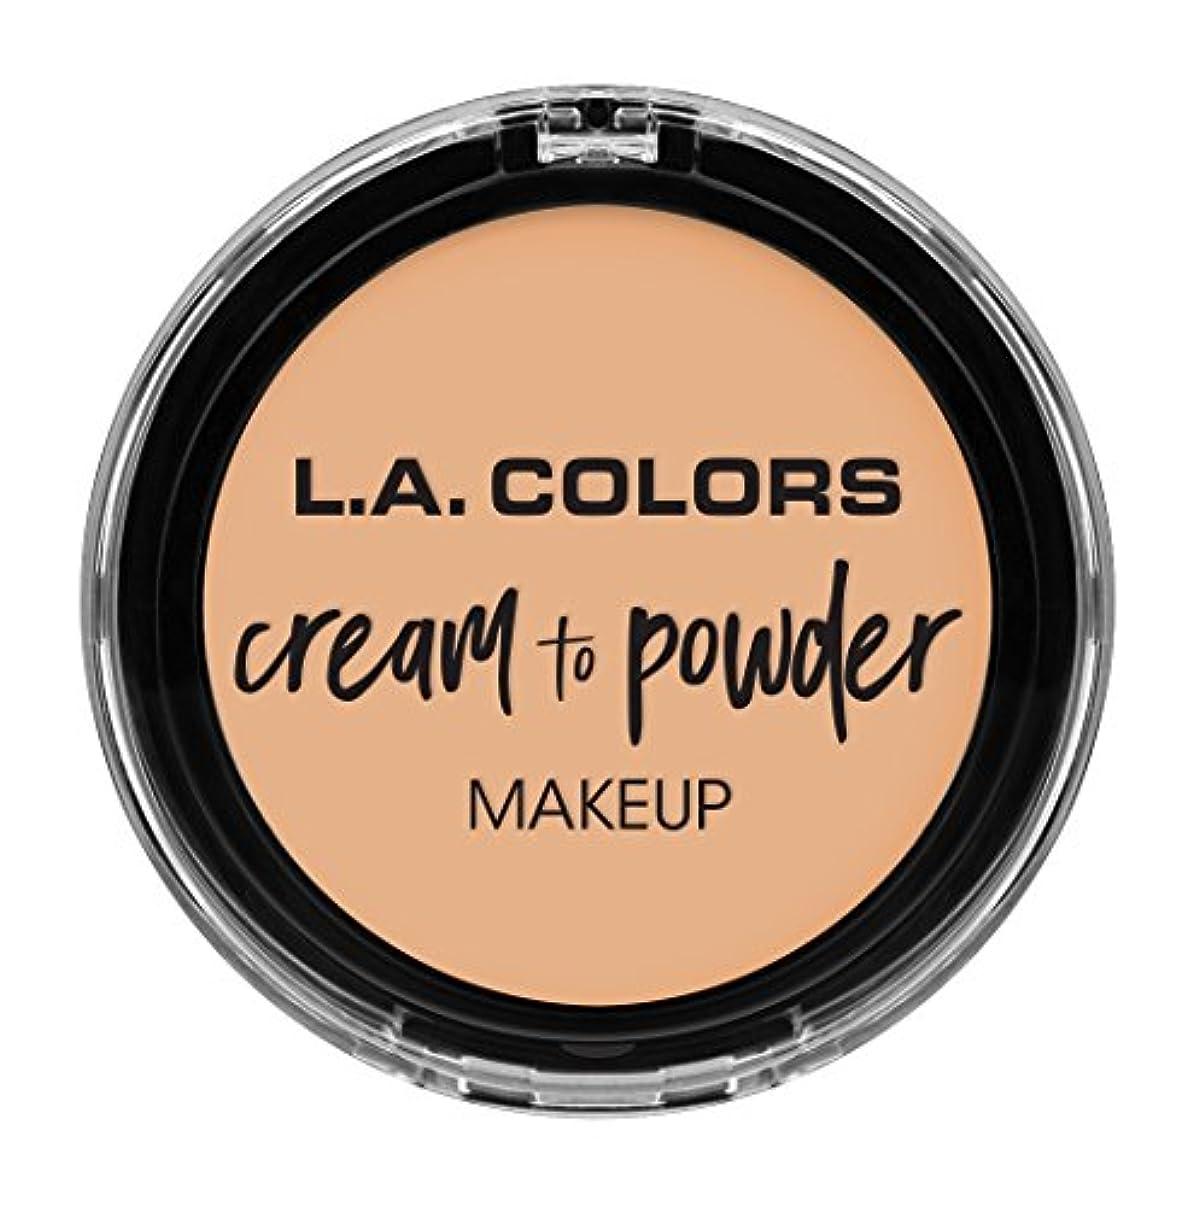 累積教室風景L.A. COLORS Cream To Powder Foundation - Buff (並行輸入品)